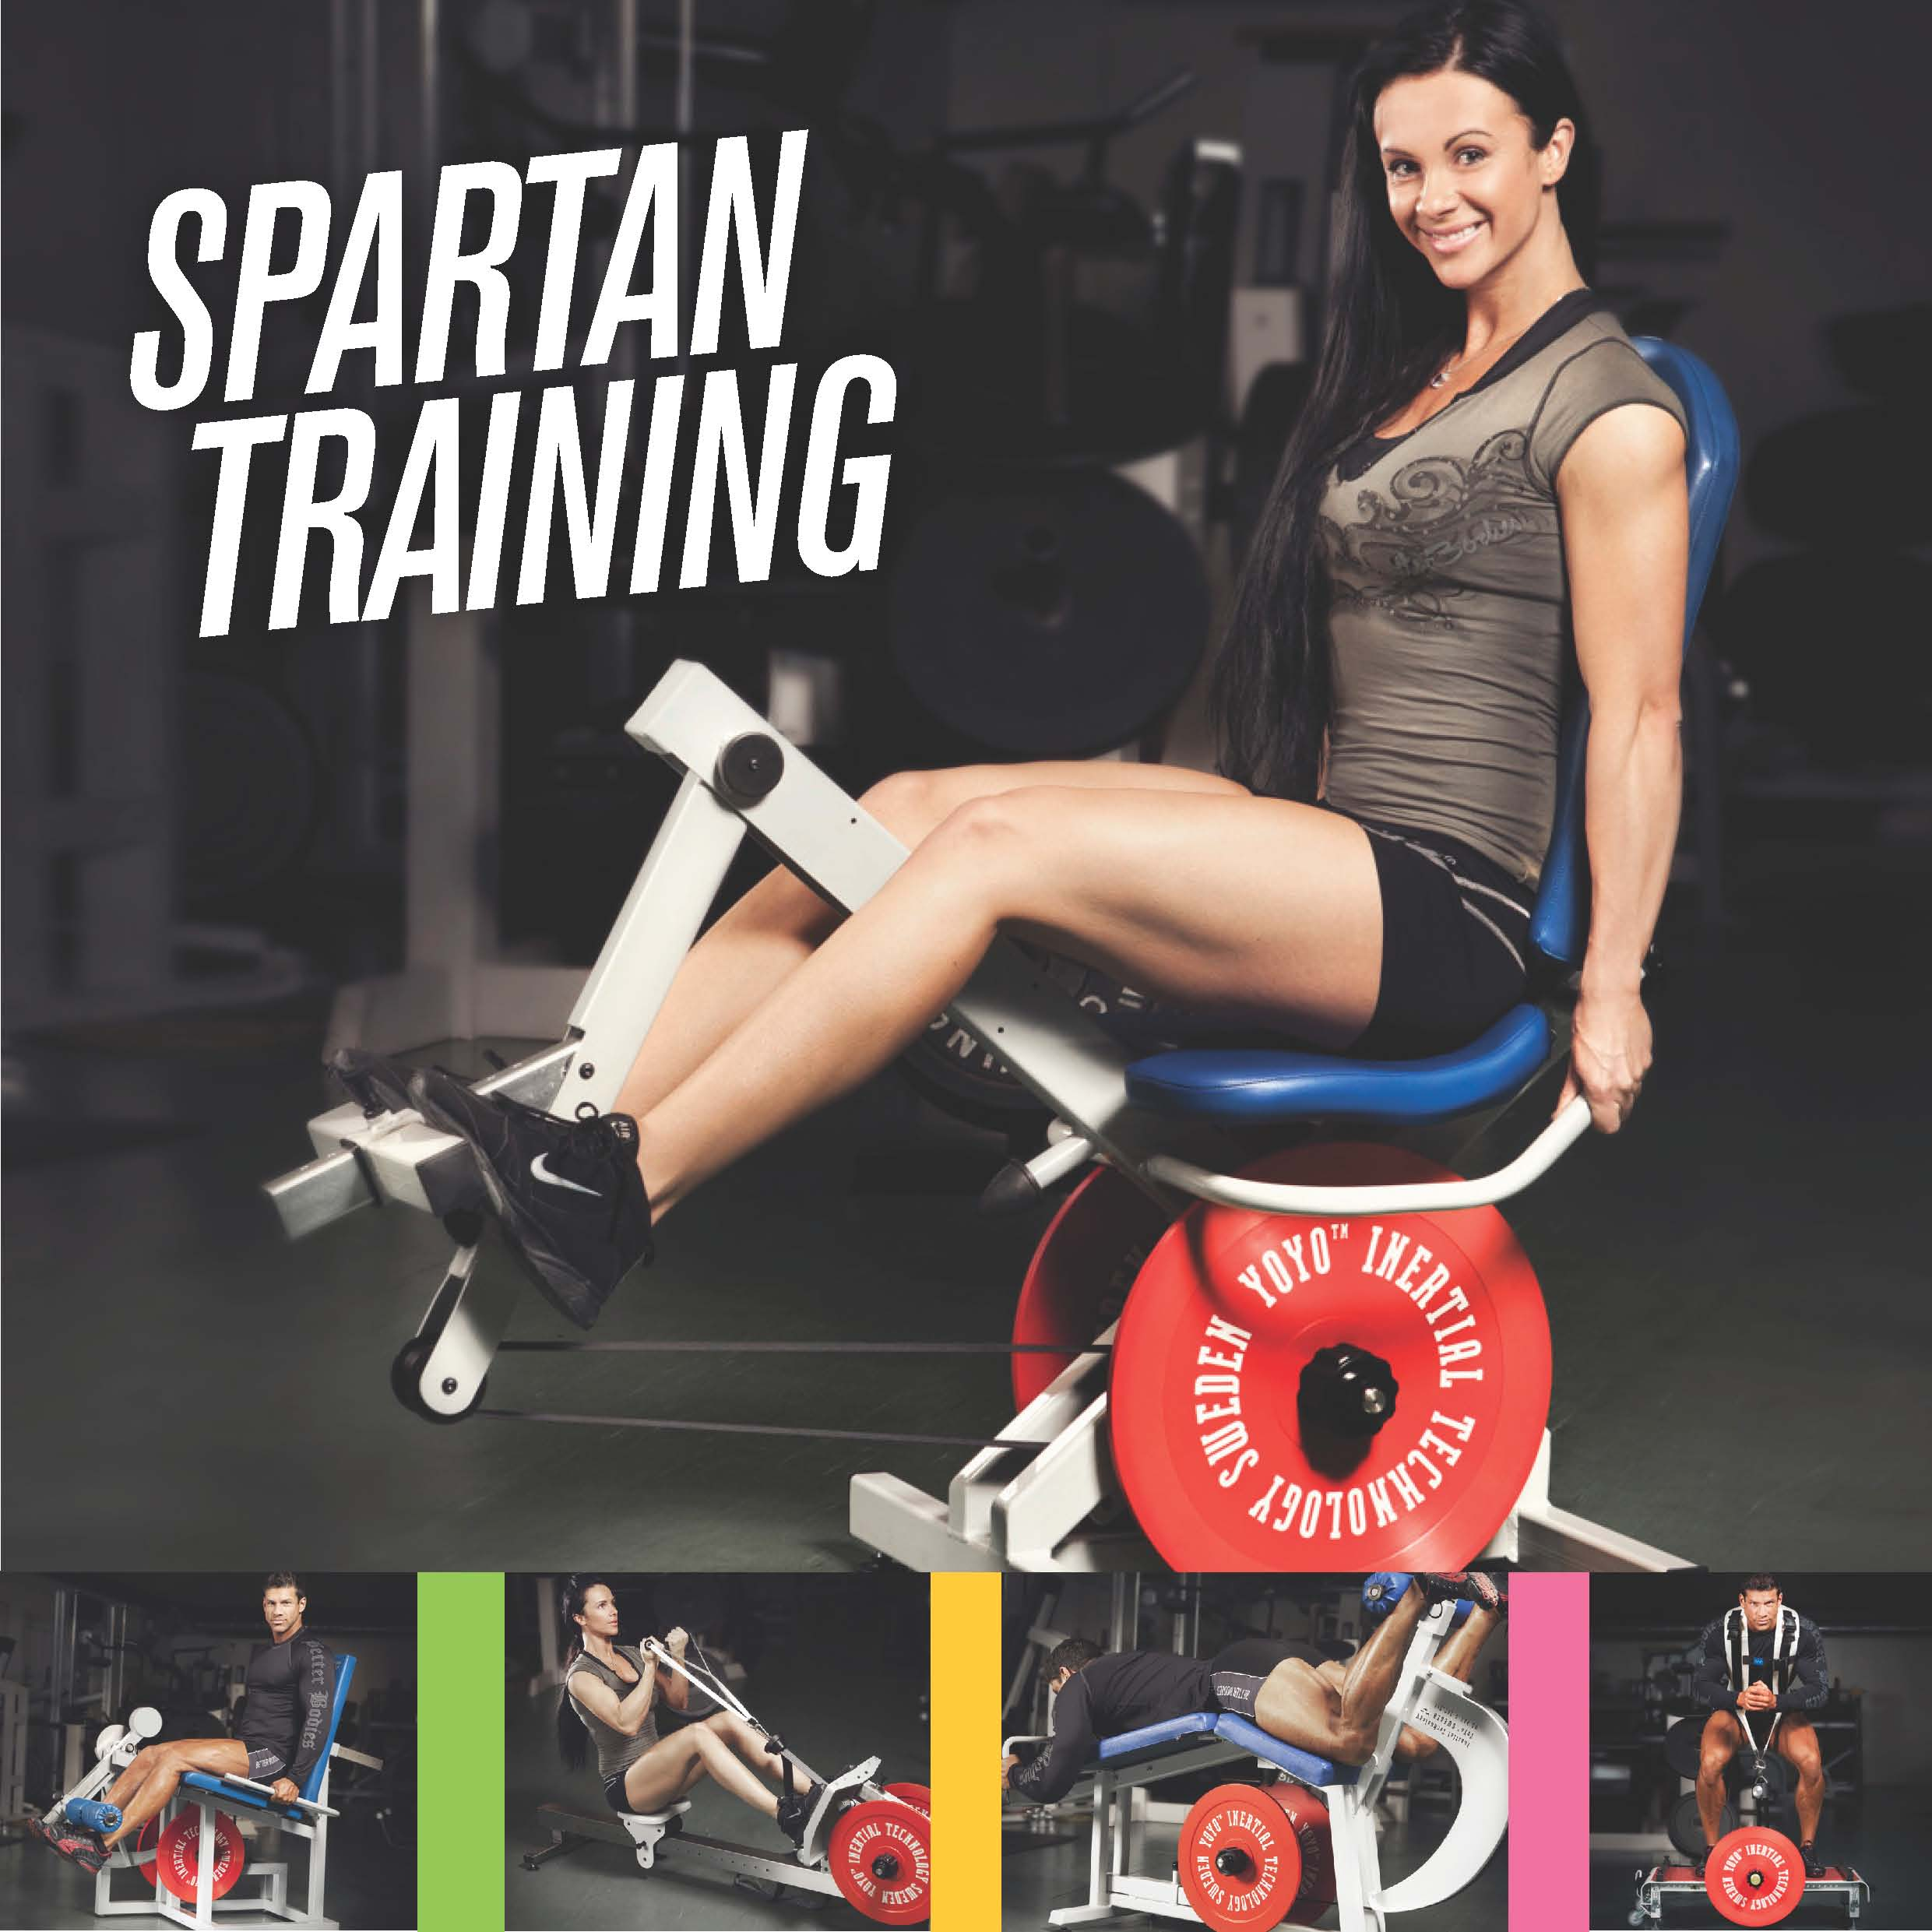 Spartan Nhance 4-sid_v2 paket_Page_1